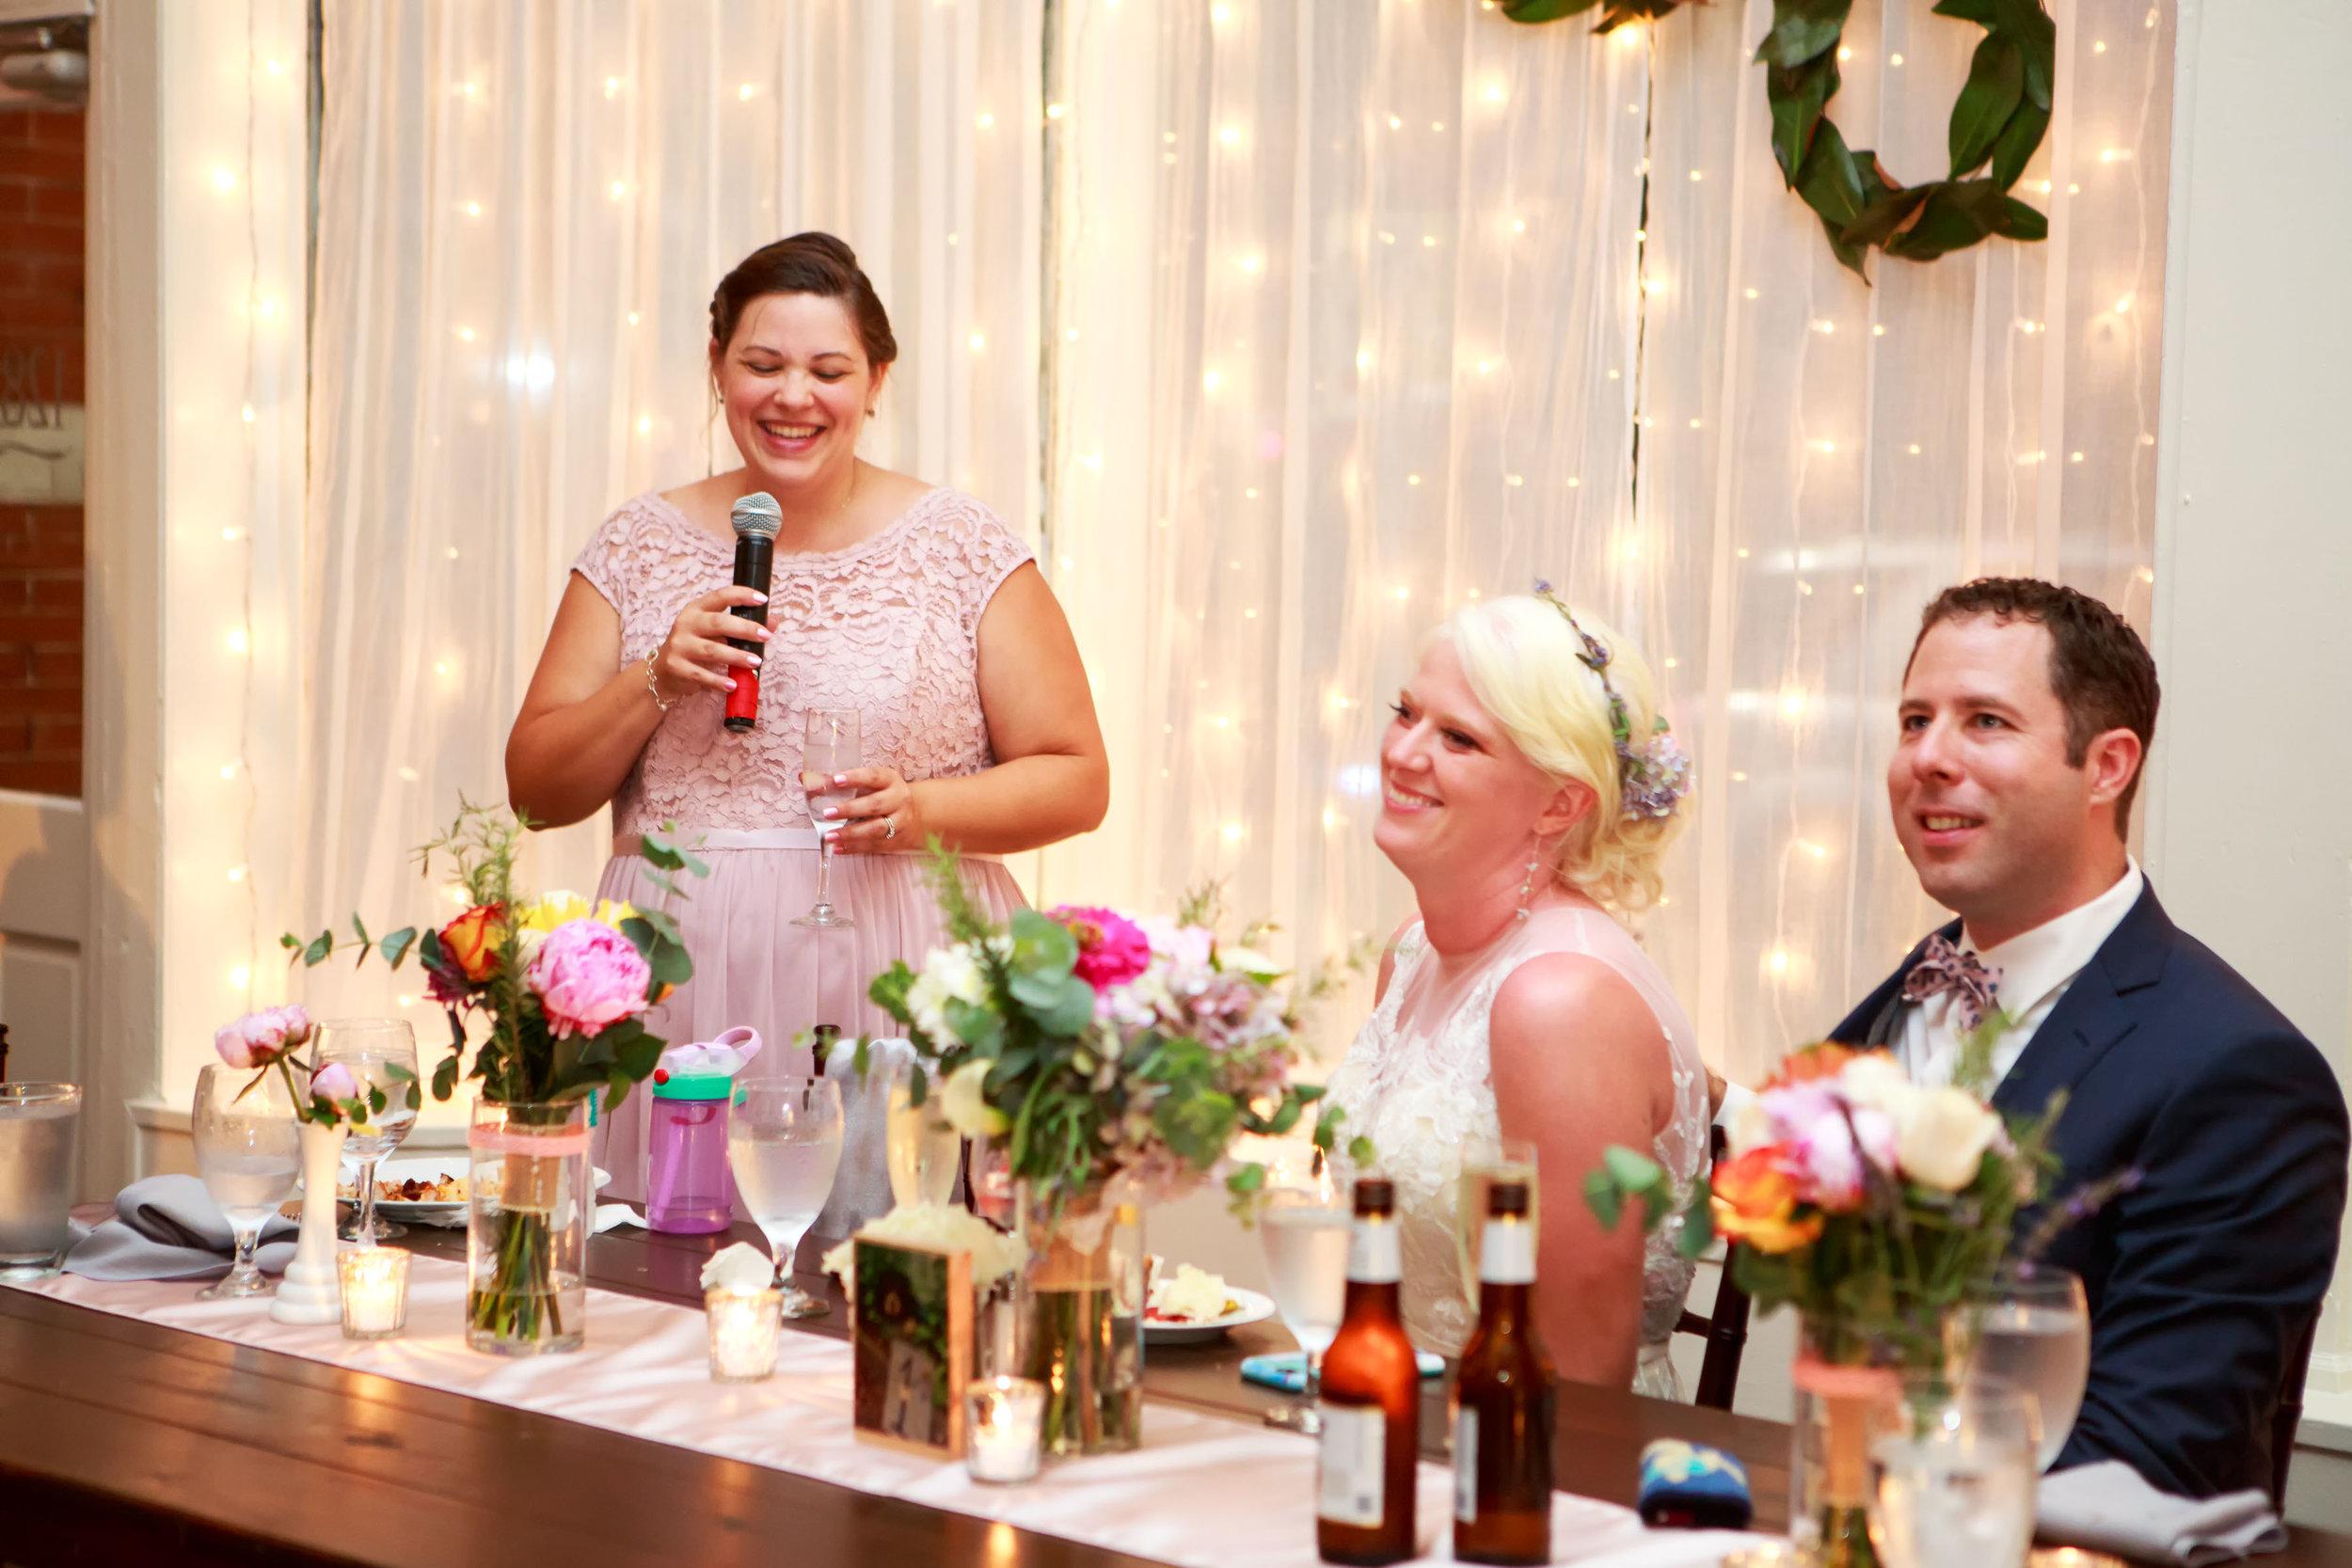 128-South-Wedding-Wilmington-NC-Photographer-Reception-93.jpg